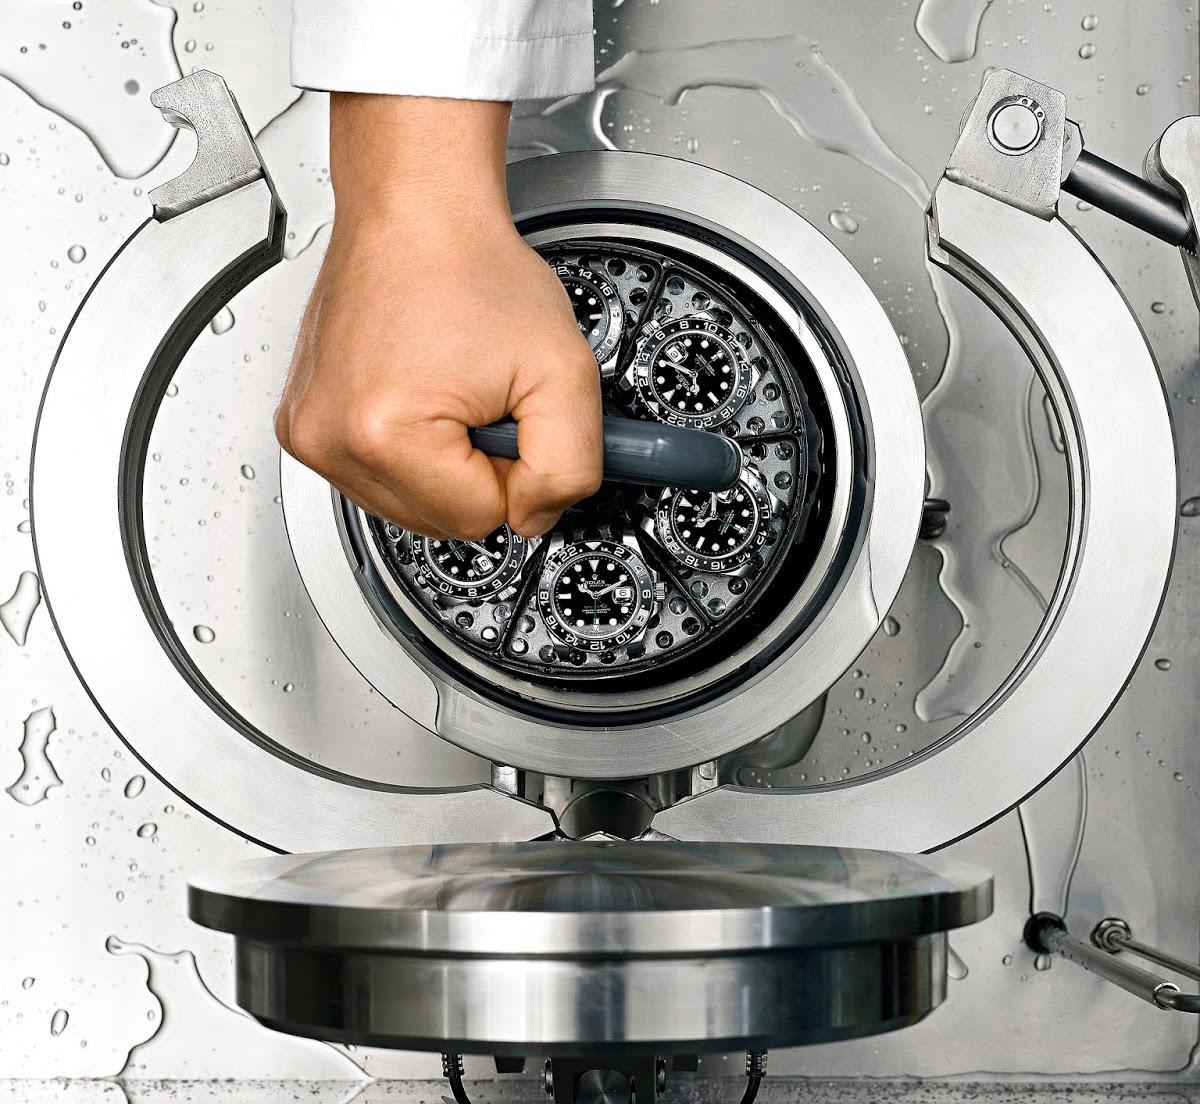 Rolex water resistant test